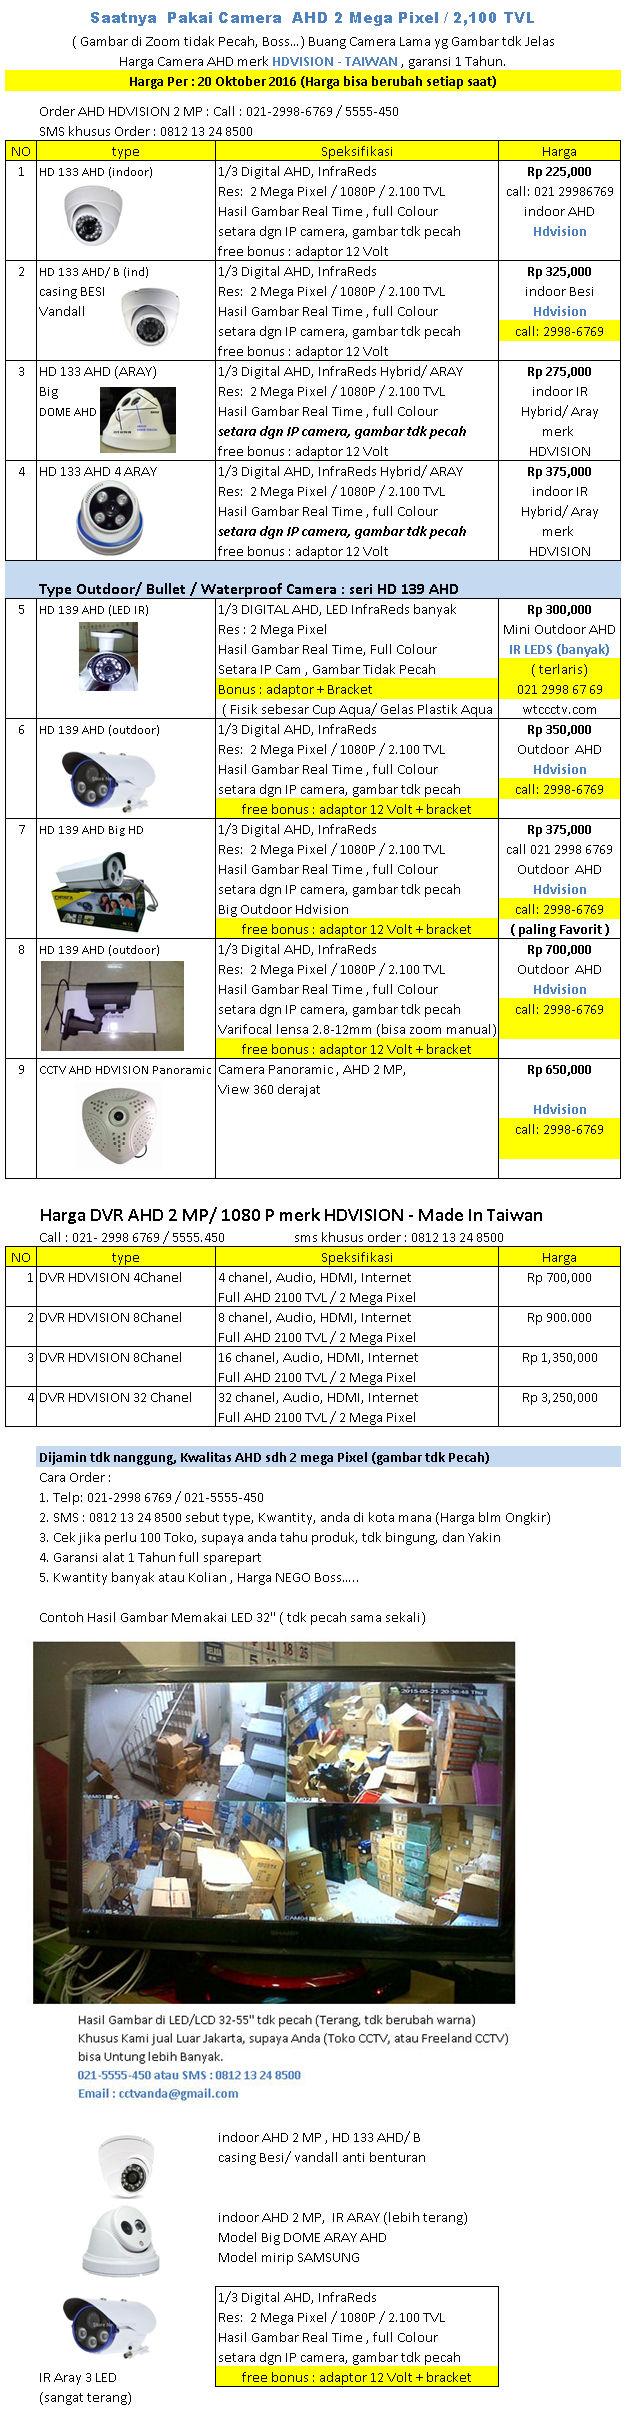 Harga Camera CCTV Merk AHD  Per 20 Oktober 2016 - WTC CCTV